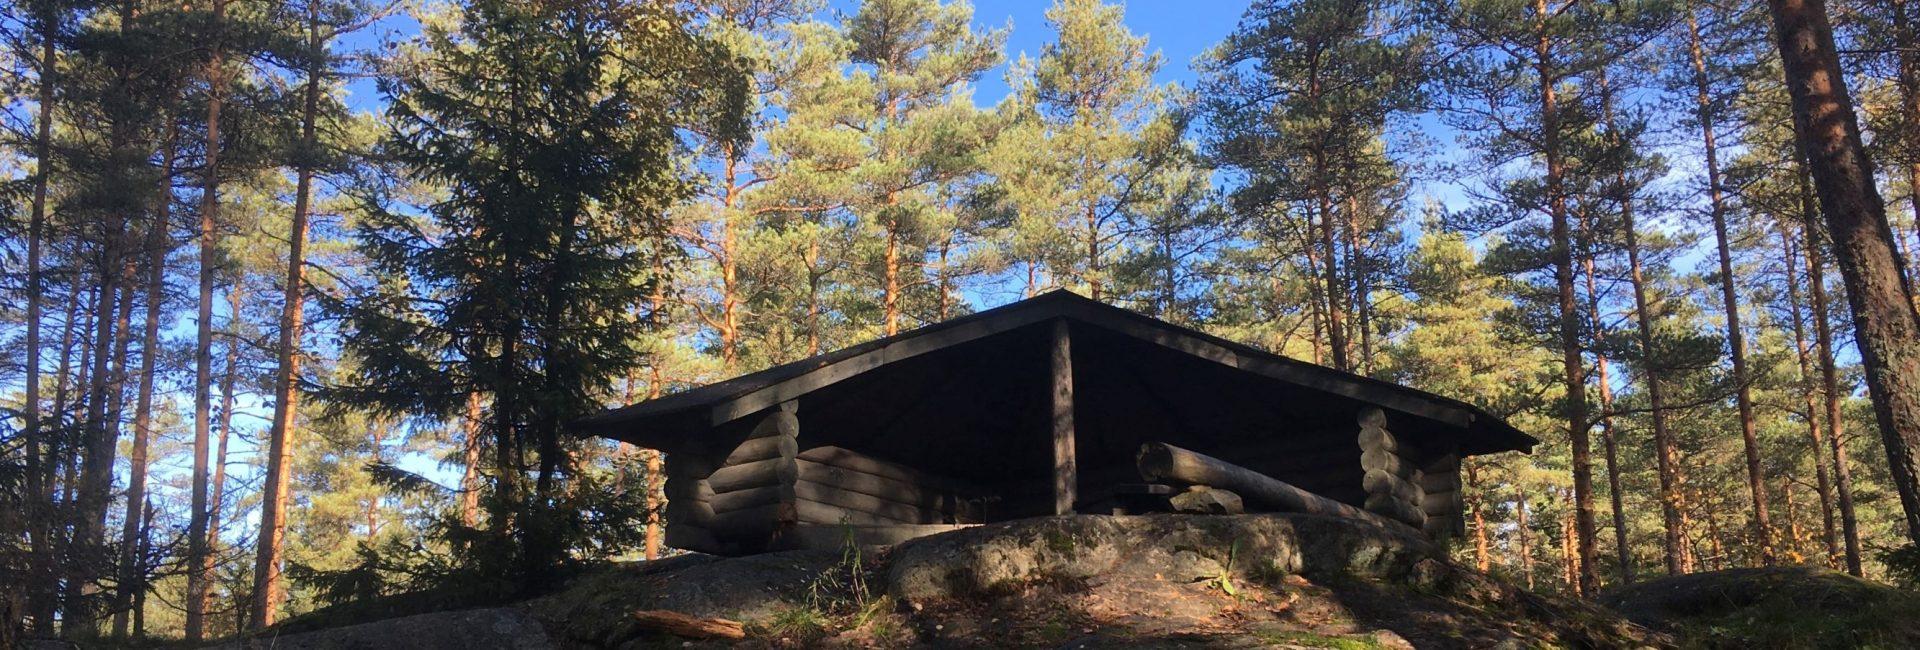 Paattinen nature trail in Lieto